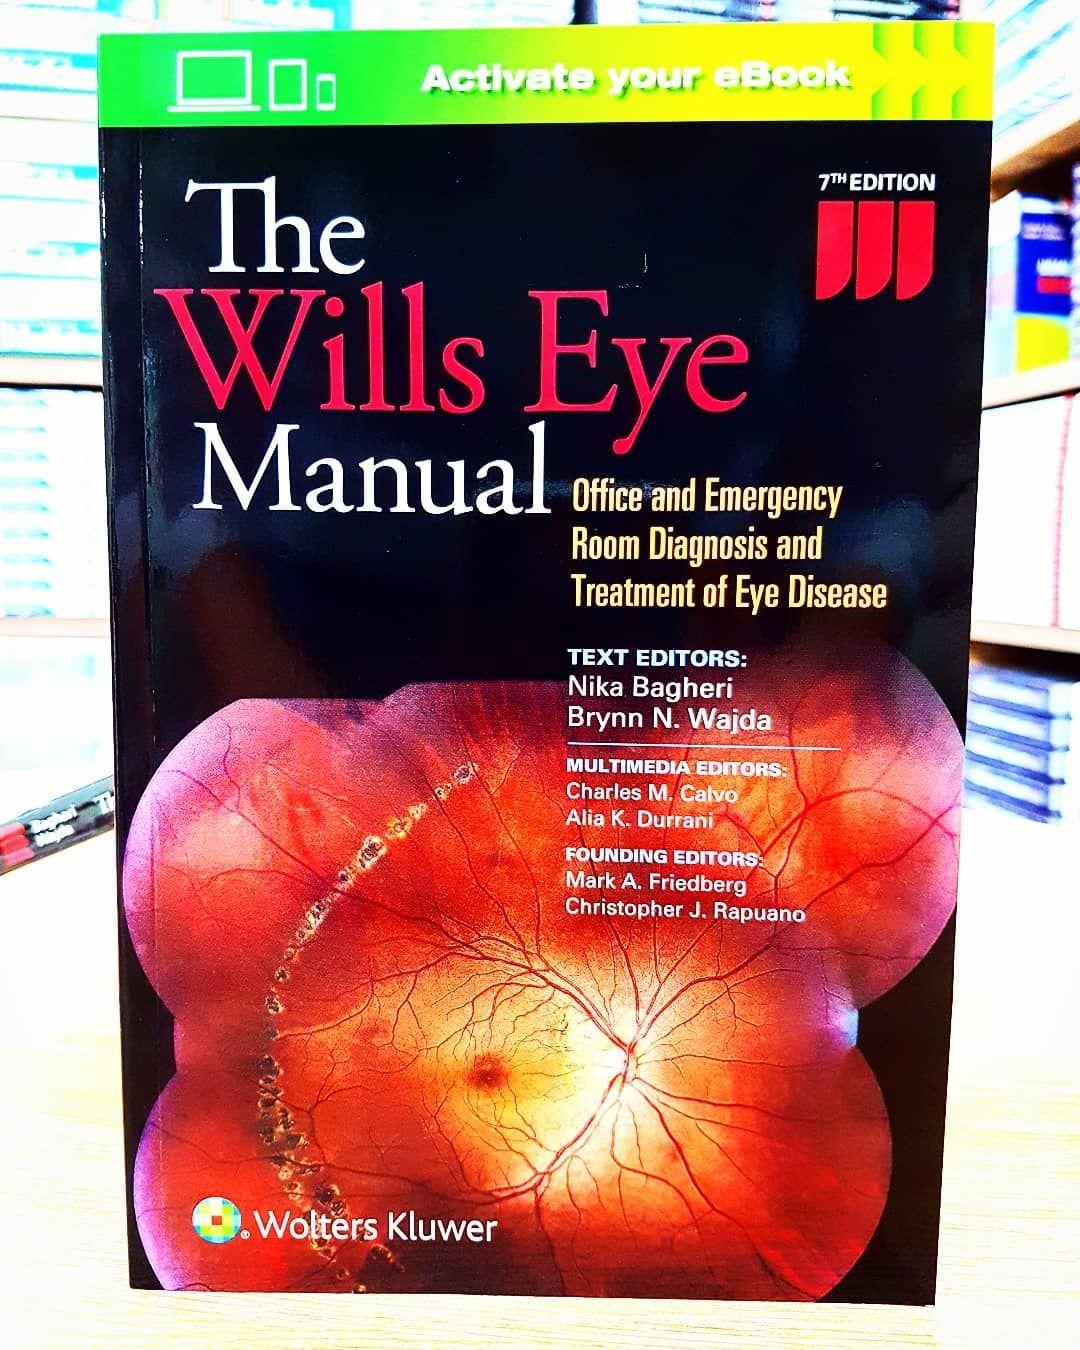 The Wills Eye Manual. . للطلب والاستفسار :- -whatsapp: +962 797 121 818 . # medical #eye #manual #book #ABC_BOOKS #store